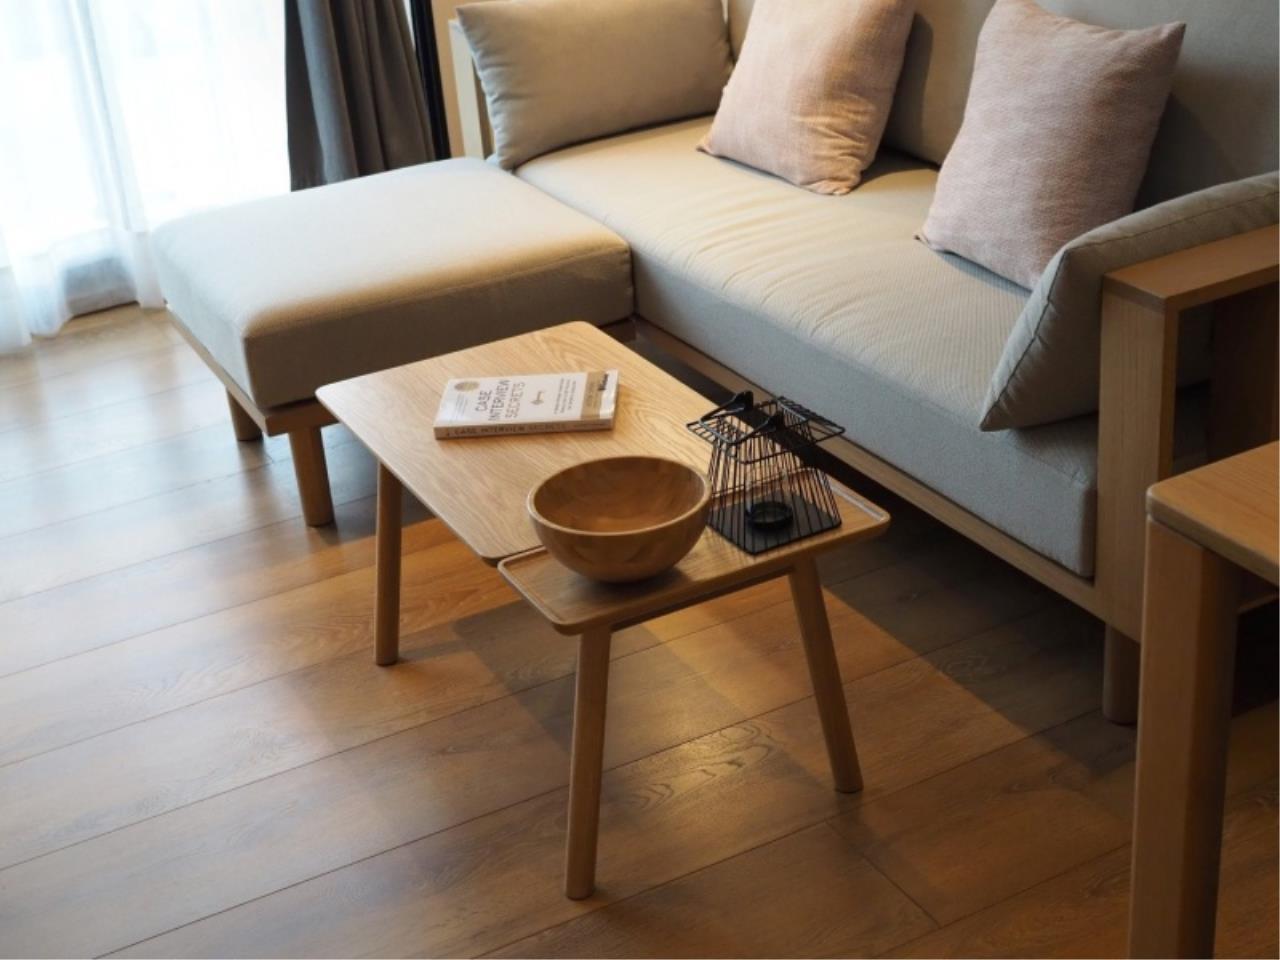 Century21 Skylux Agency's Park 24 / Condo For Rent / 2 Bedroom / 53.53 SQM / BTS Phrom Phong / Bangkok 3